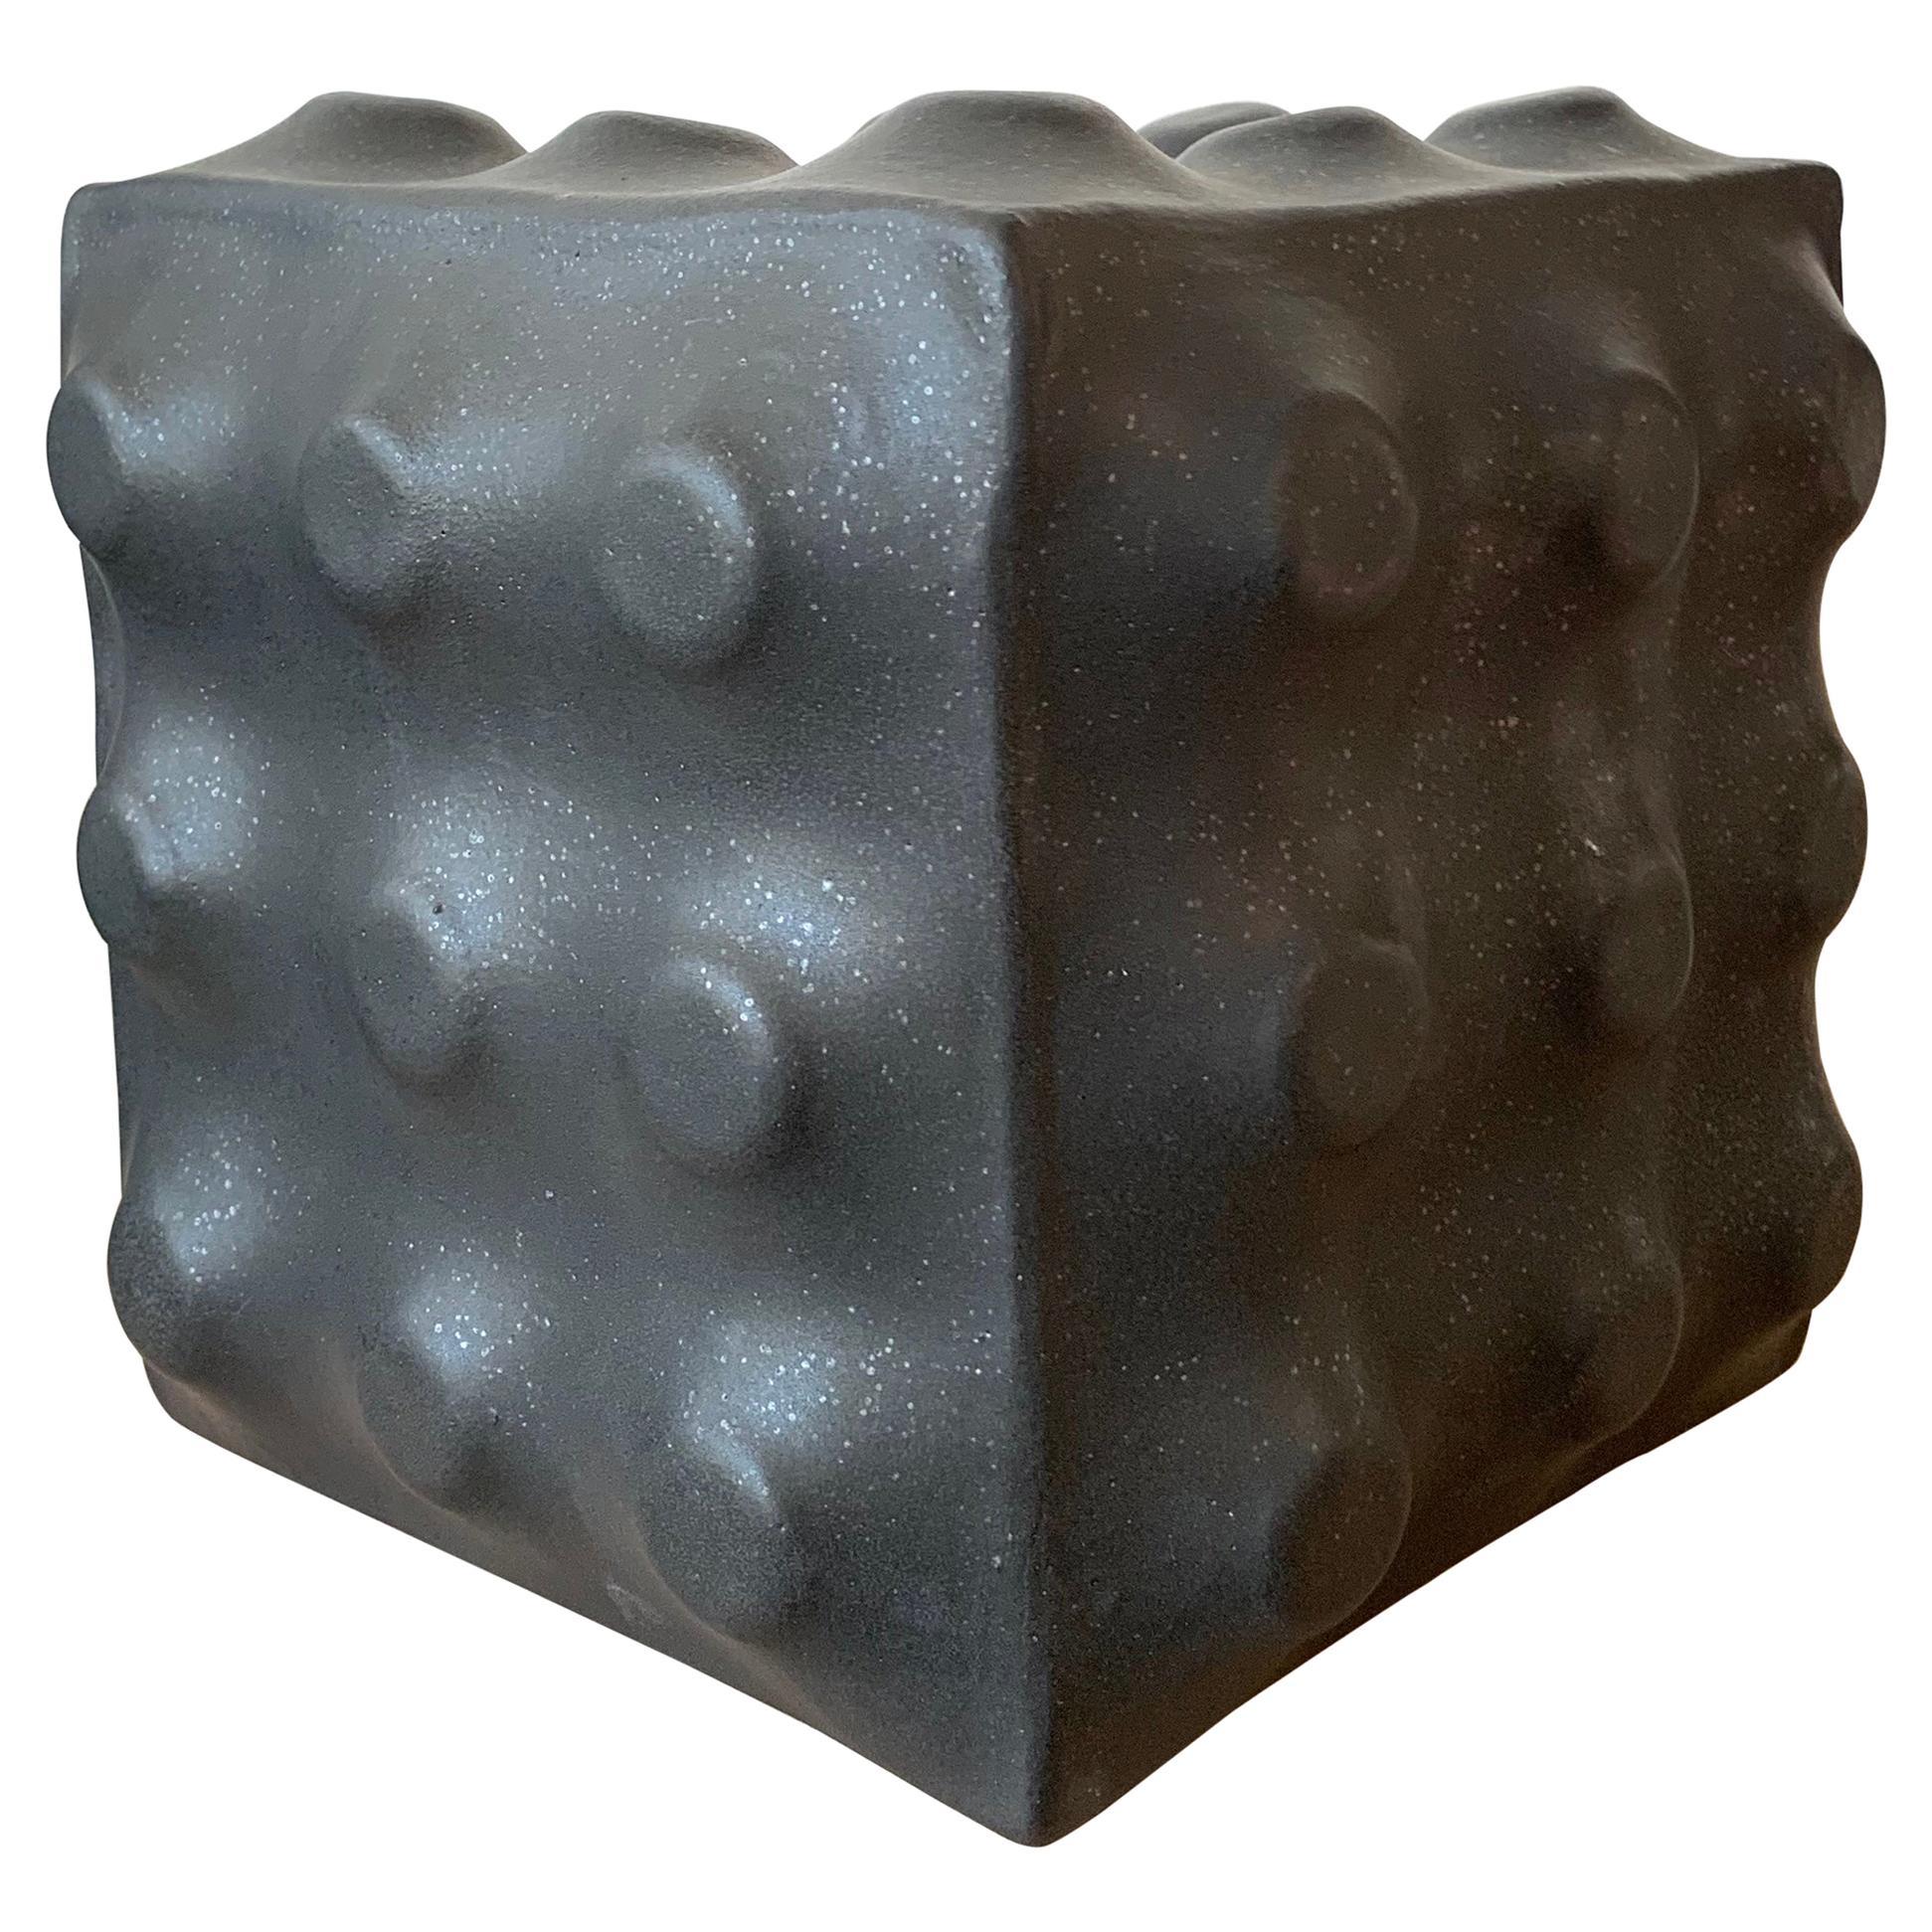 Black Ceramic Cube Sculpture by Luke Shalan